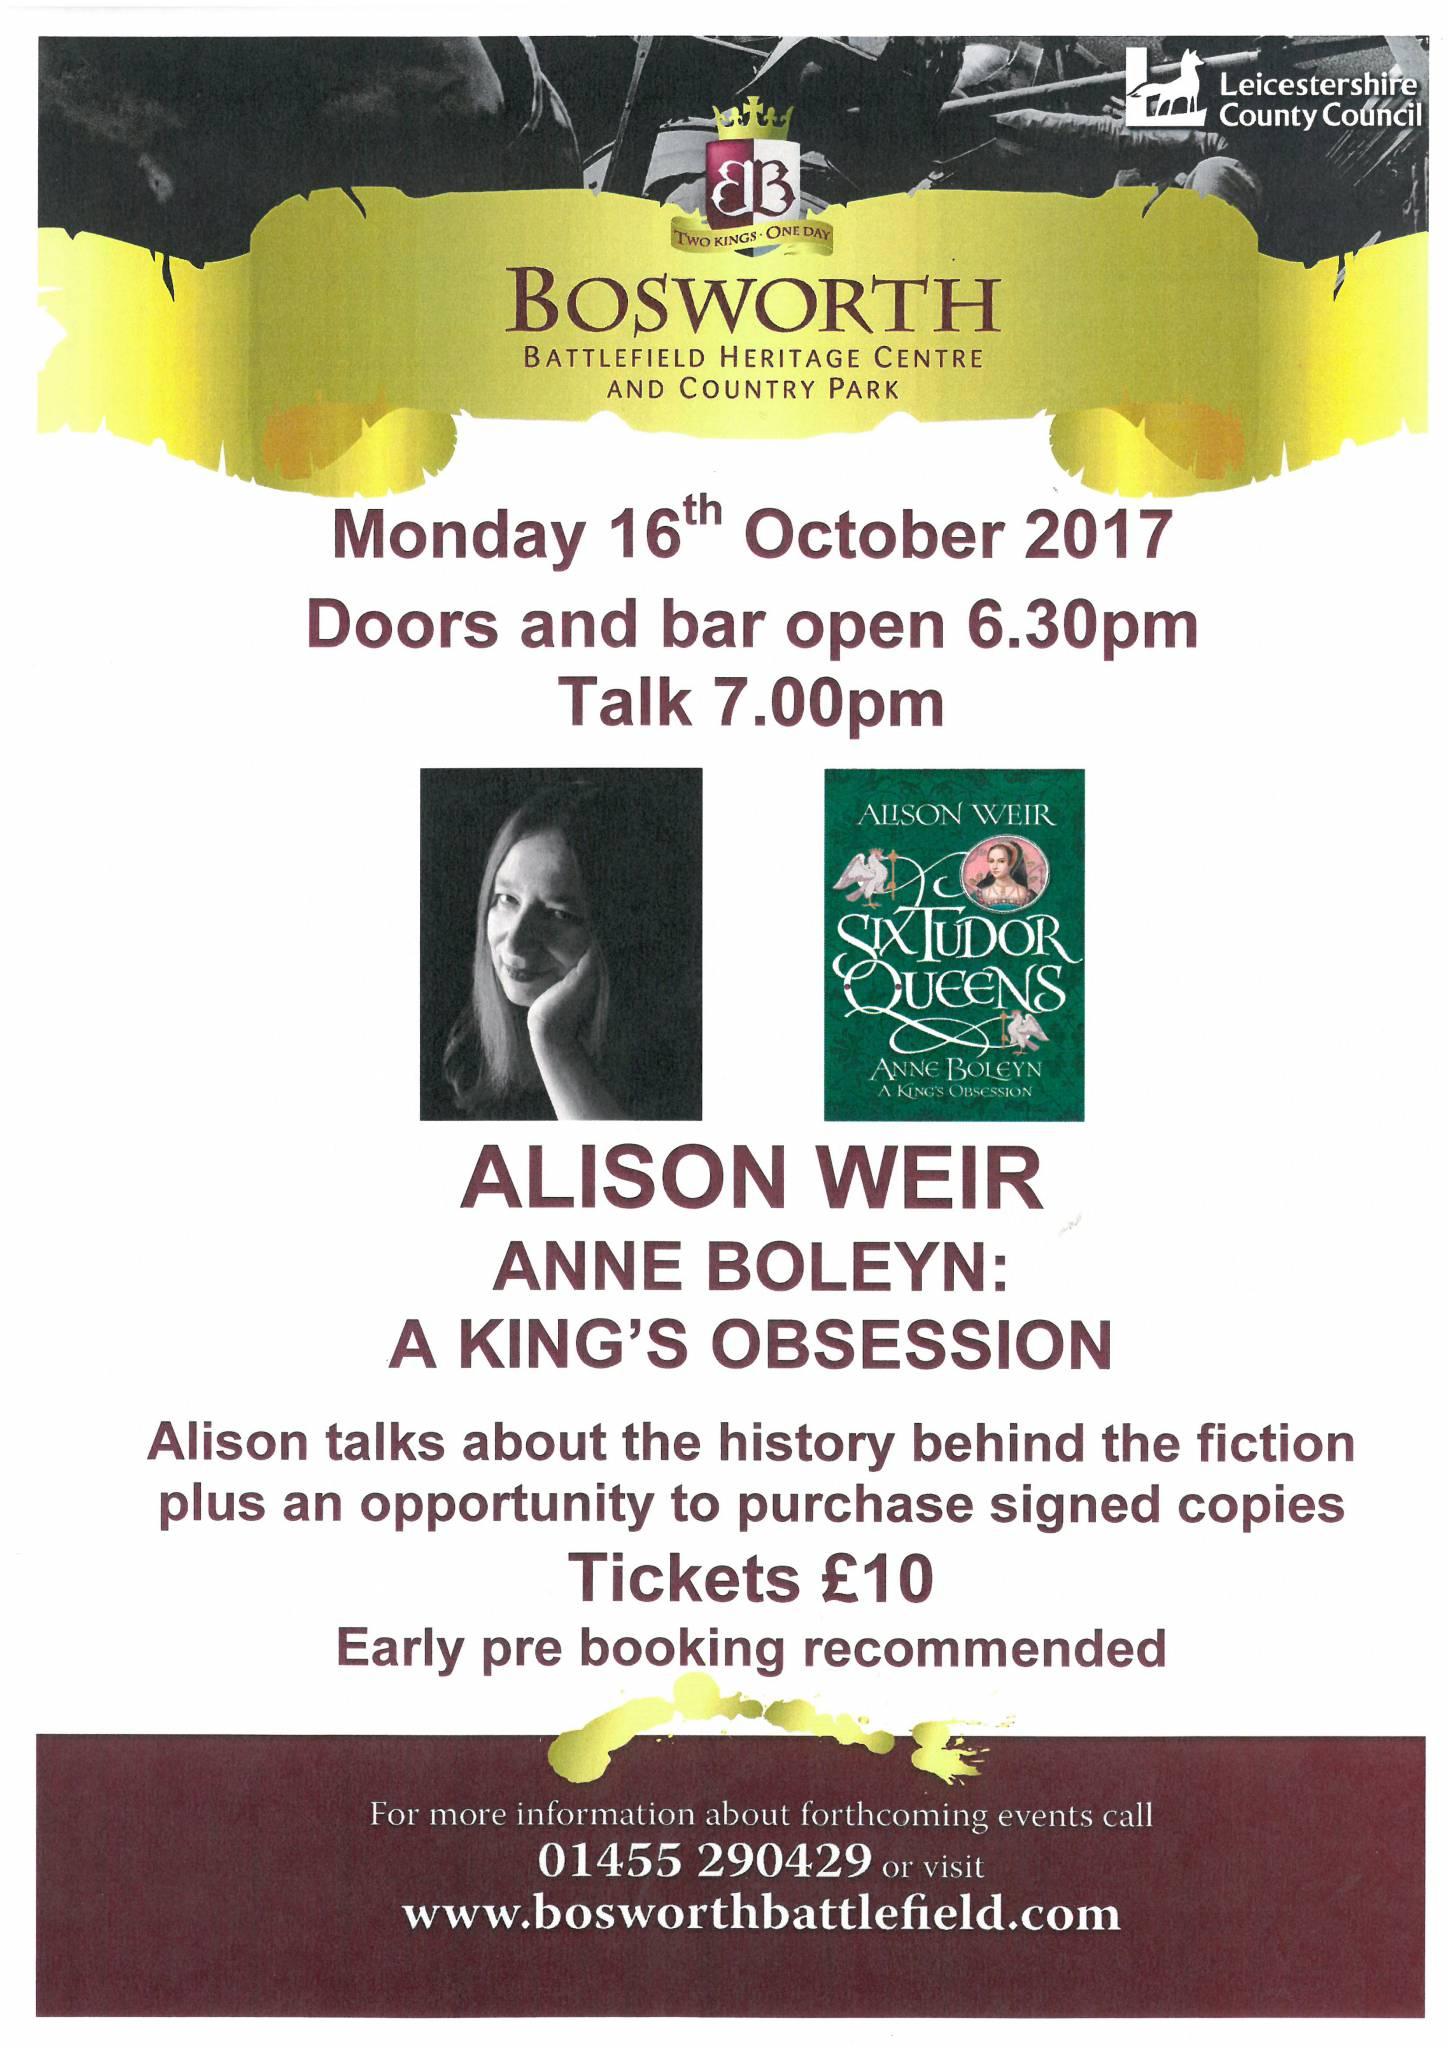 Alison Weir - Anne Boleyn: A King's Obsession (SOLD OUT)